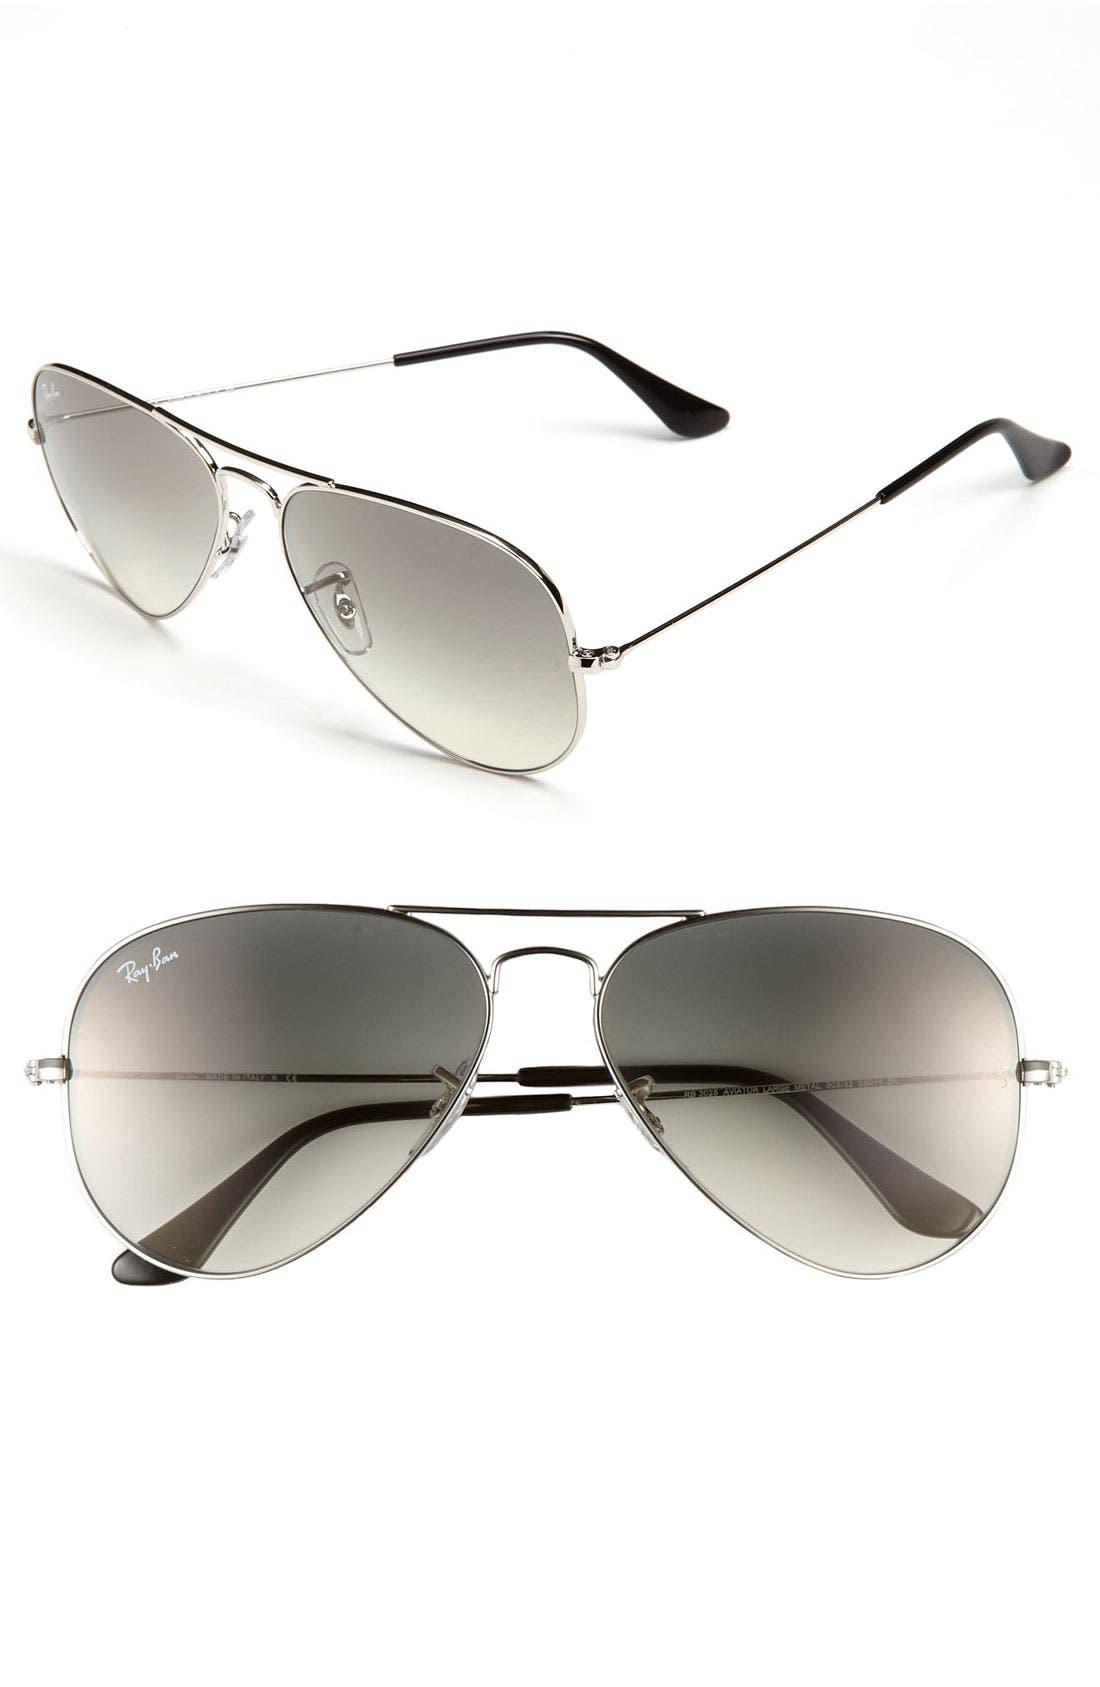 Standard Original 58mm Aviator Sunglasses,                         Main,                         color, 050